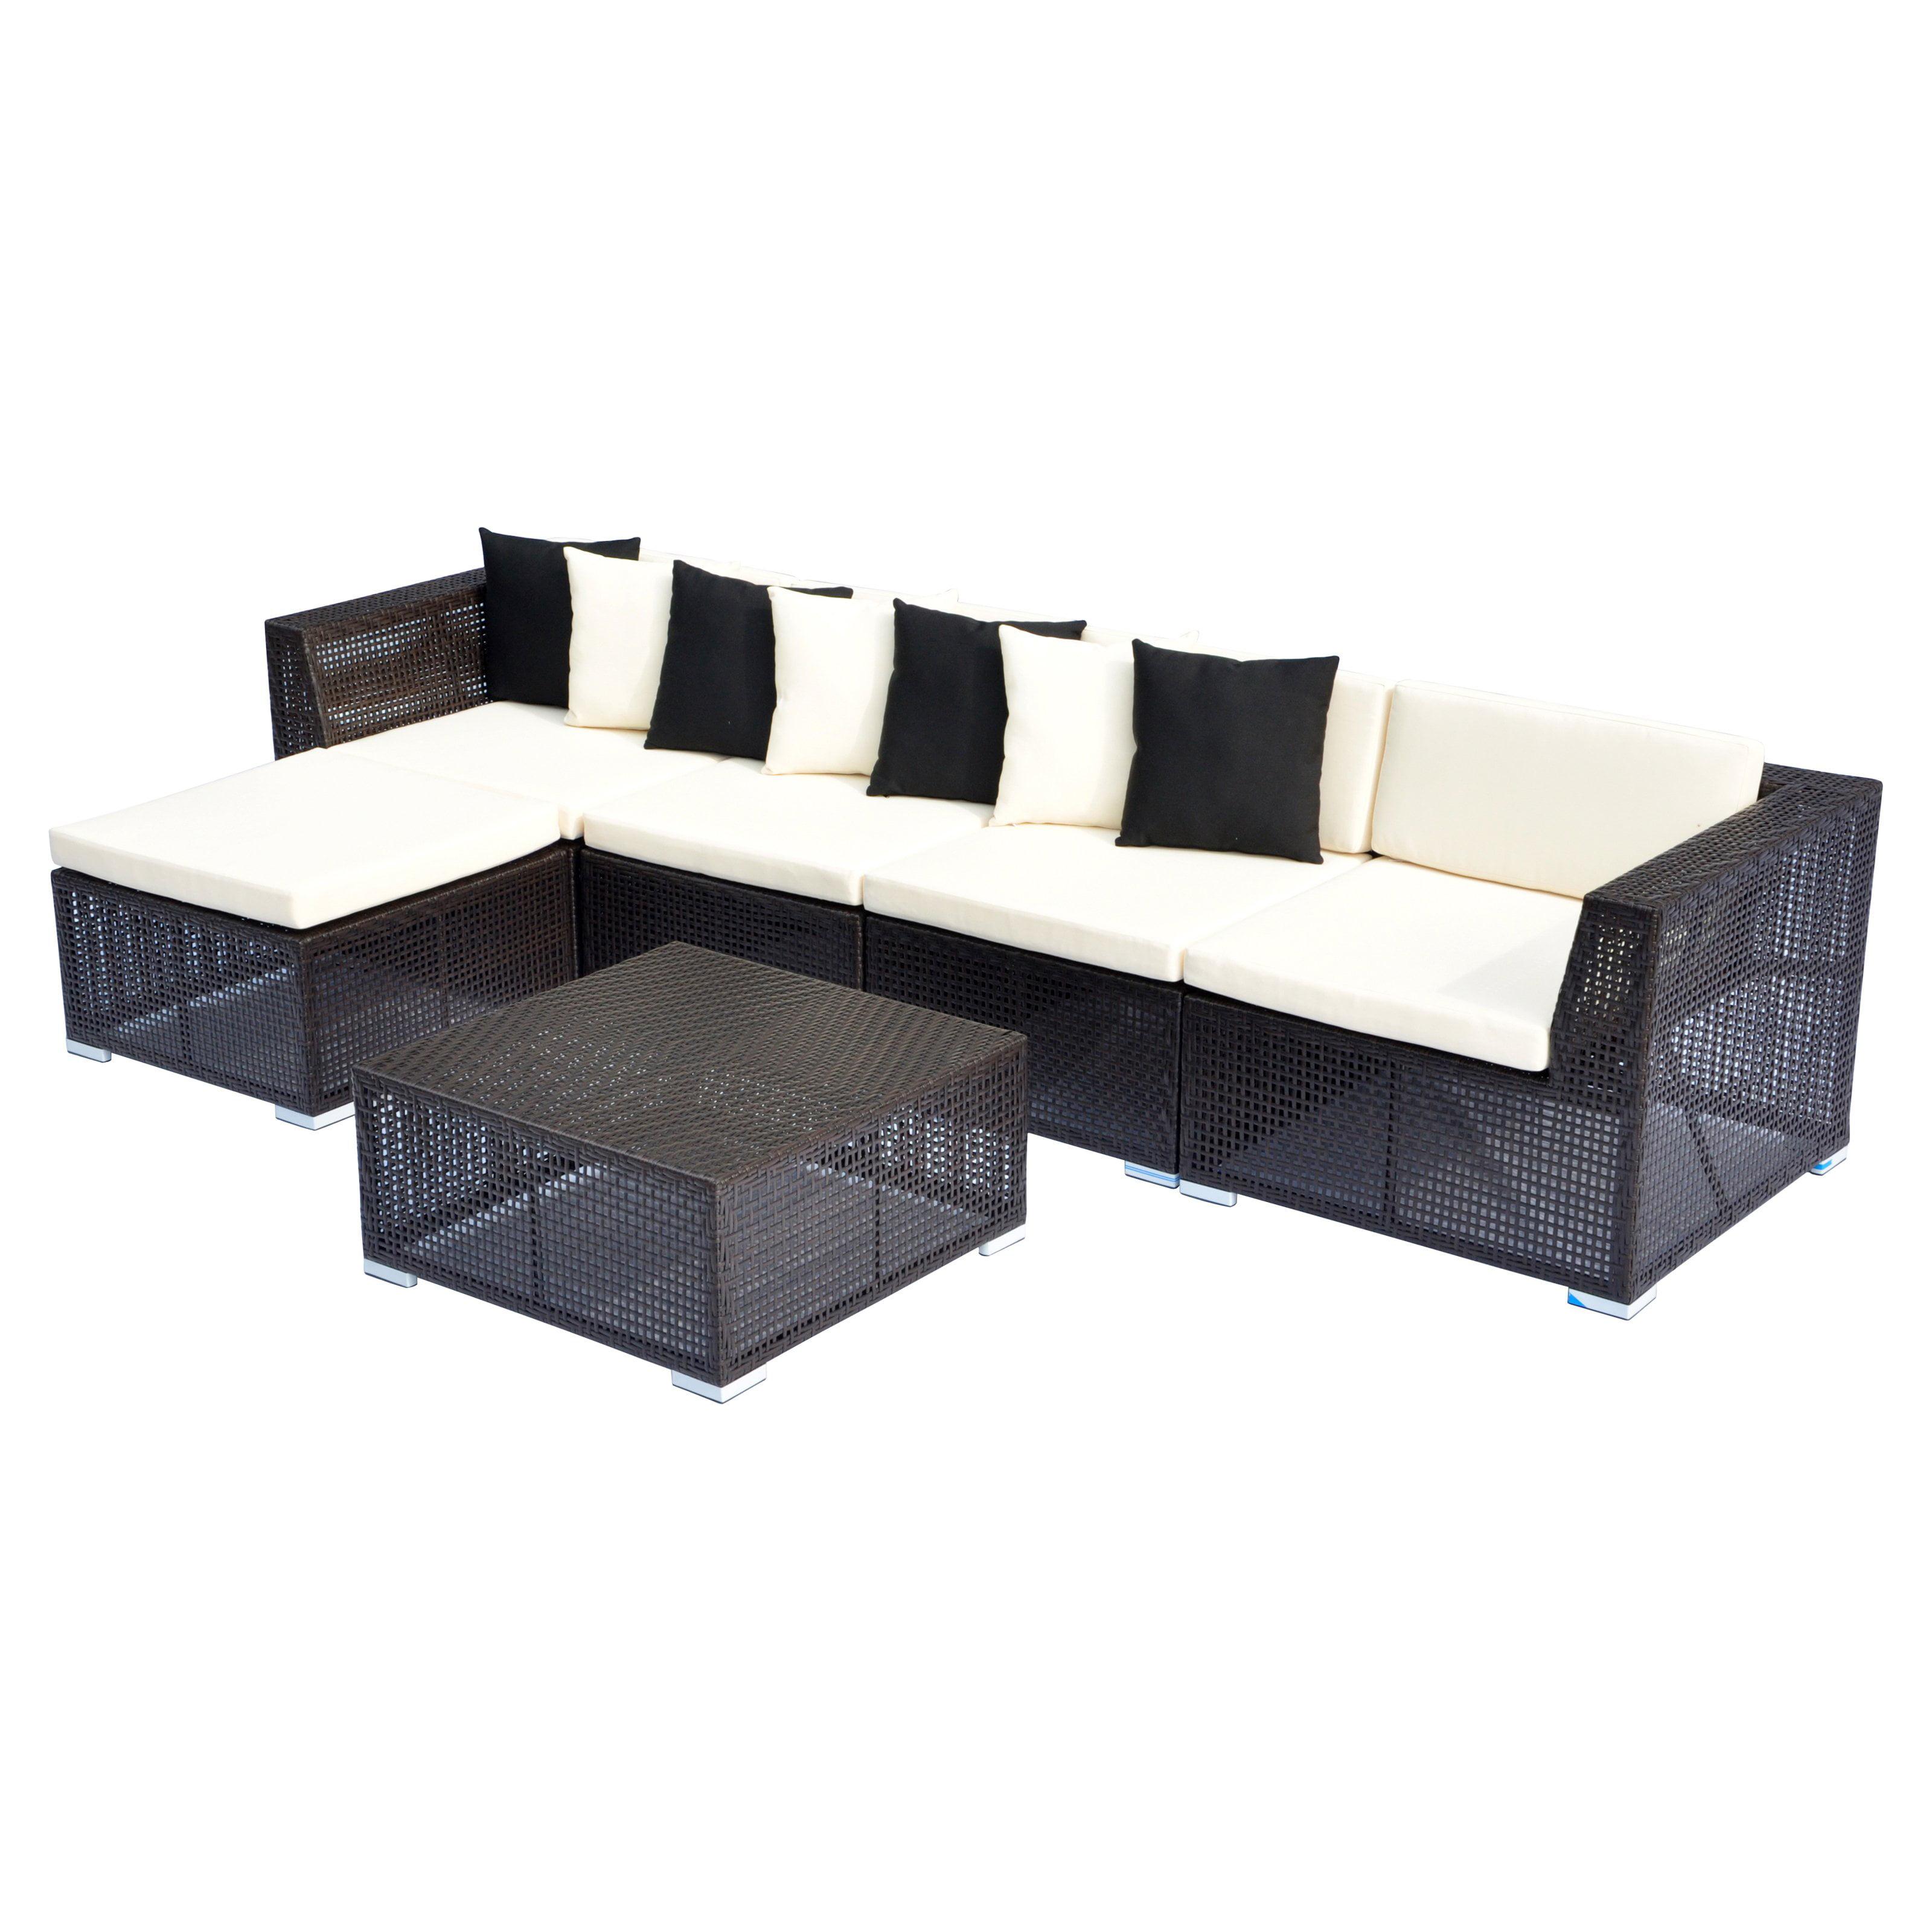 Opulence Collection 6 Piece Modular Sectional Sofa Set   Walmart.com